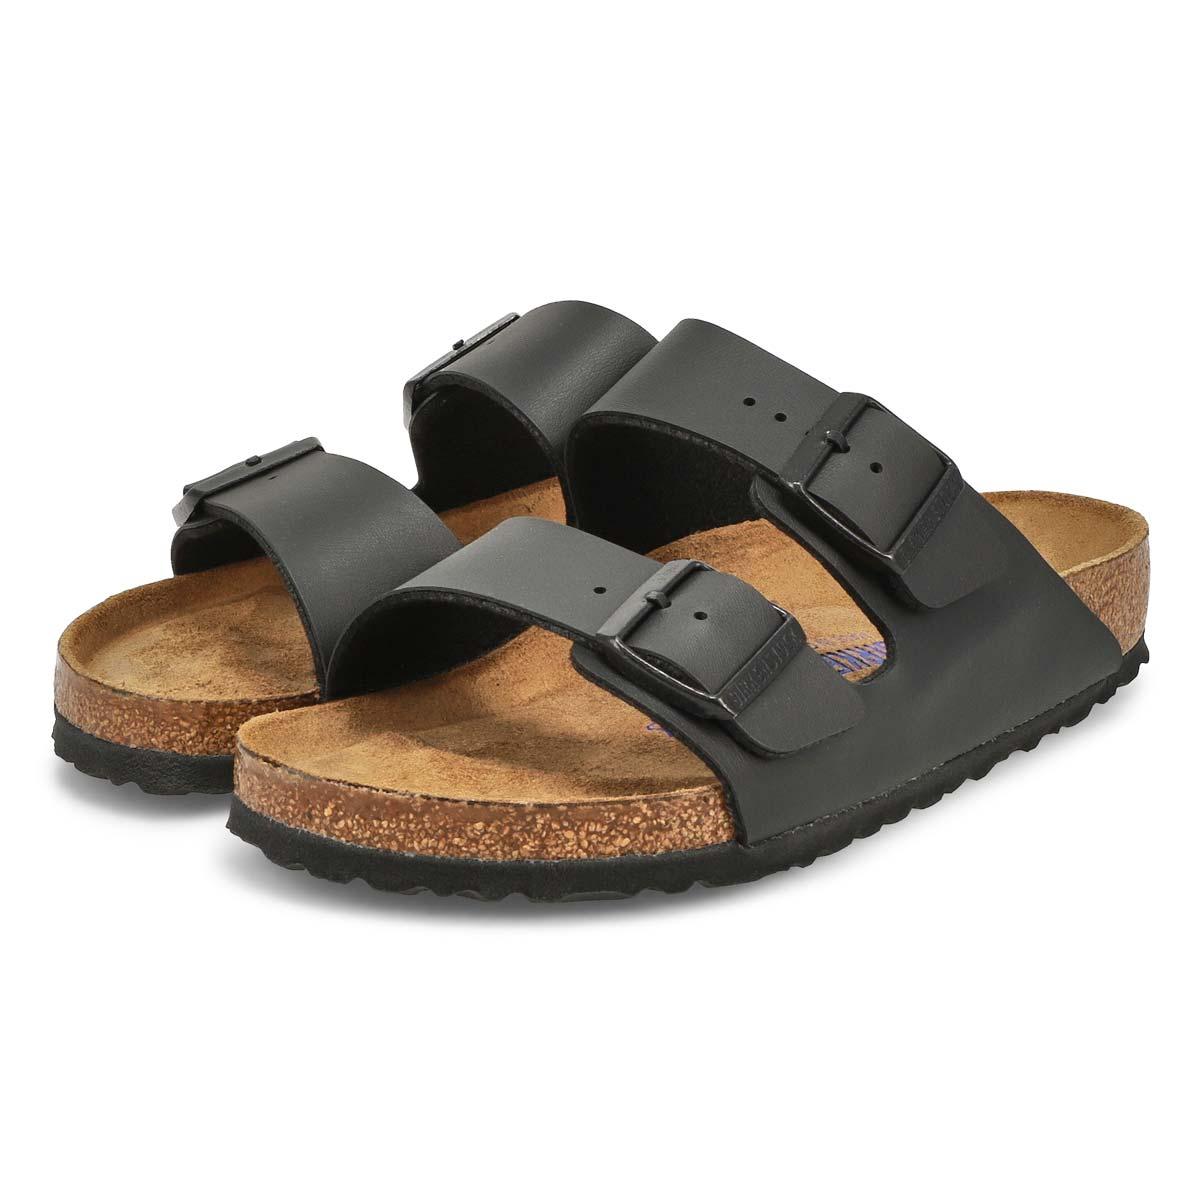 Sandales 2brides ARIZONA SF, noir, femmes